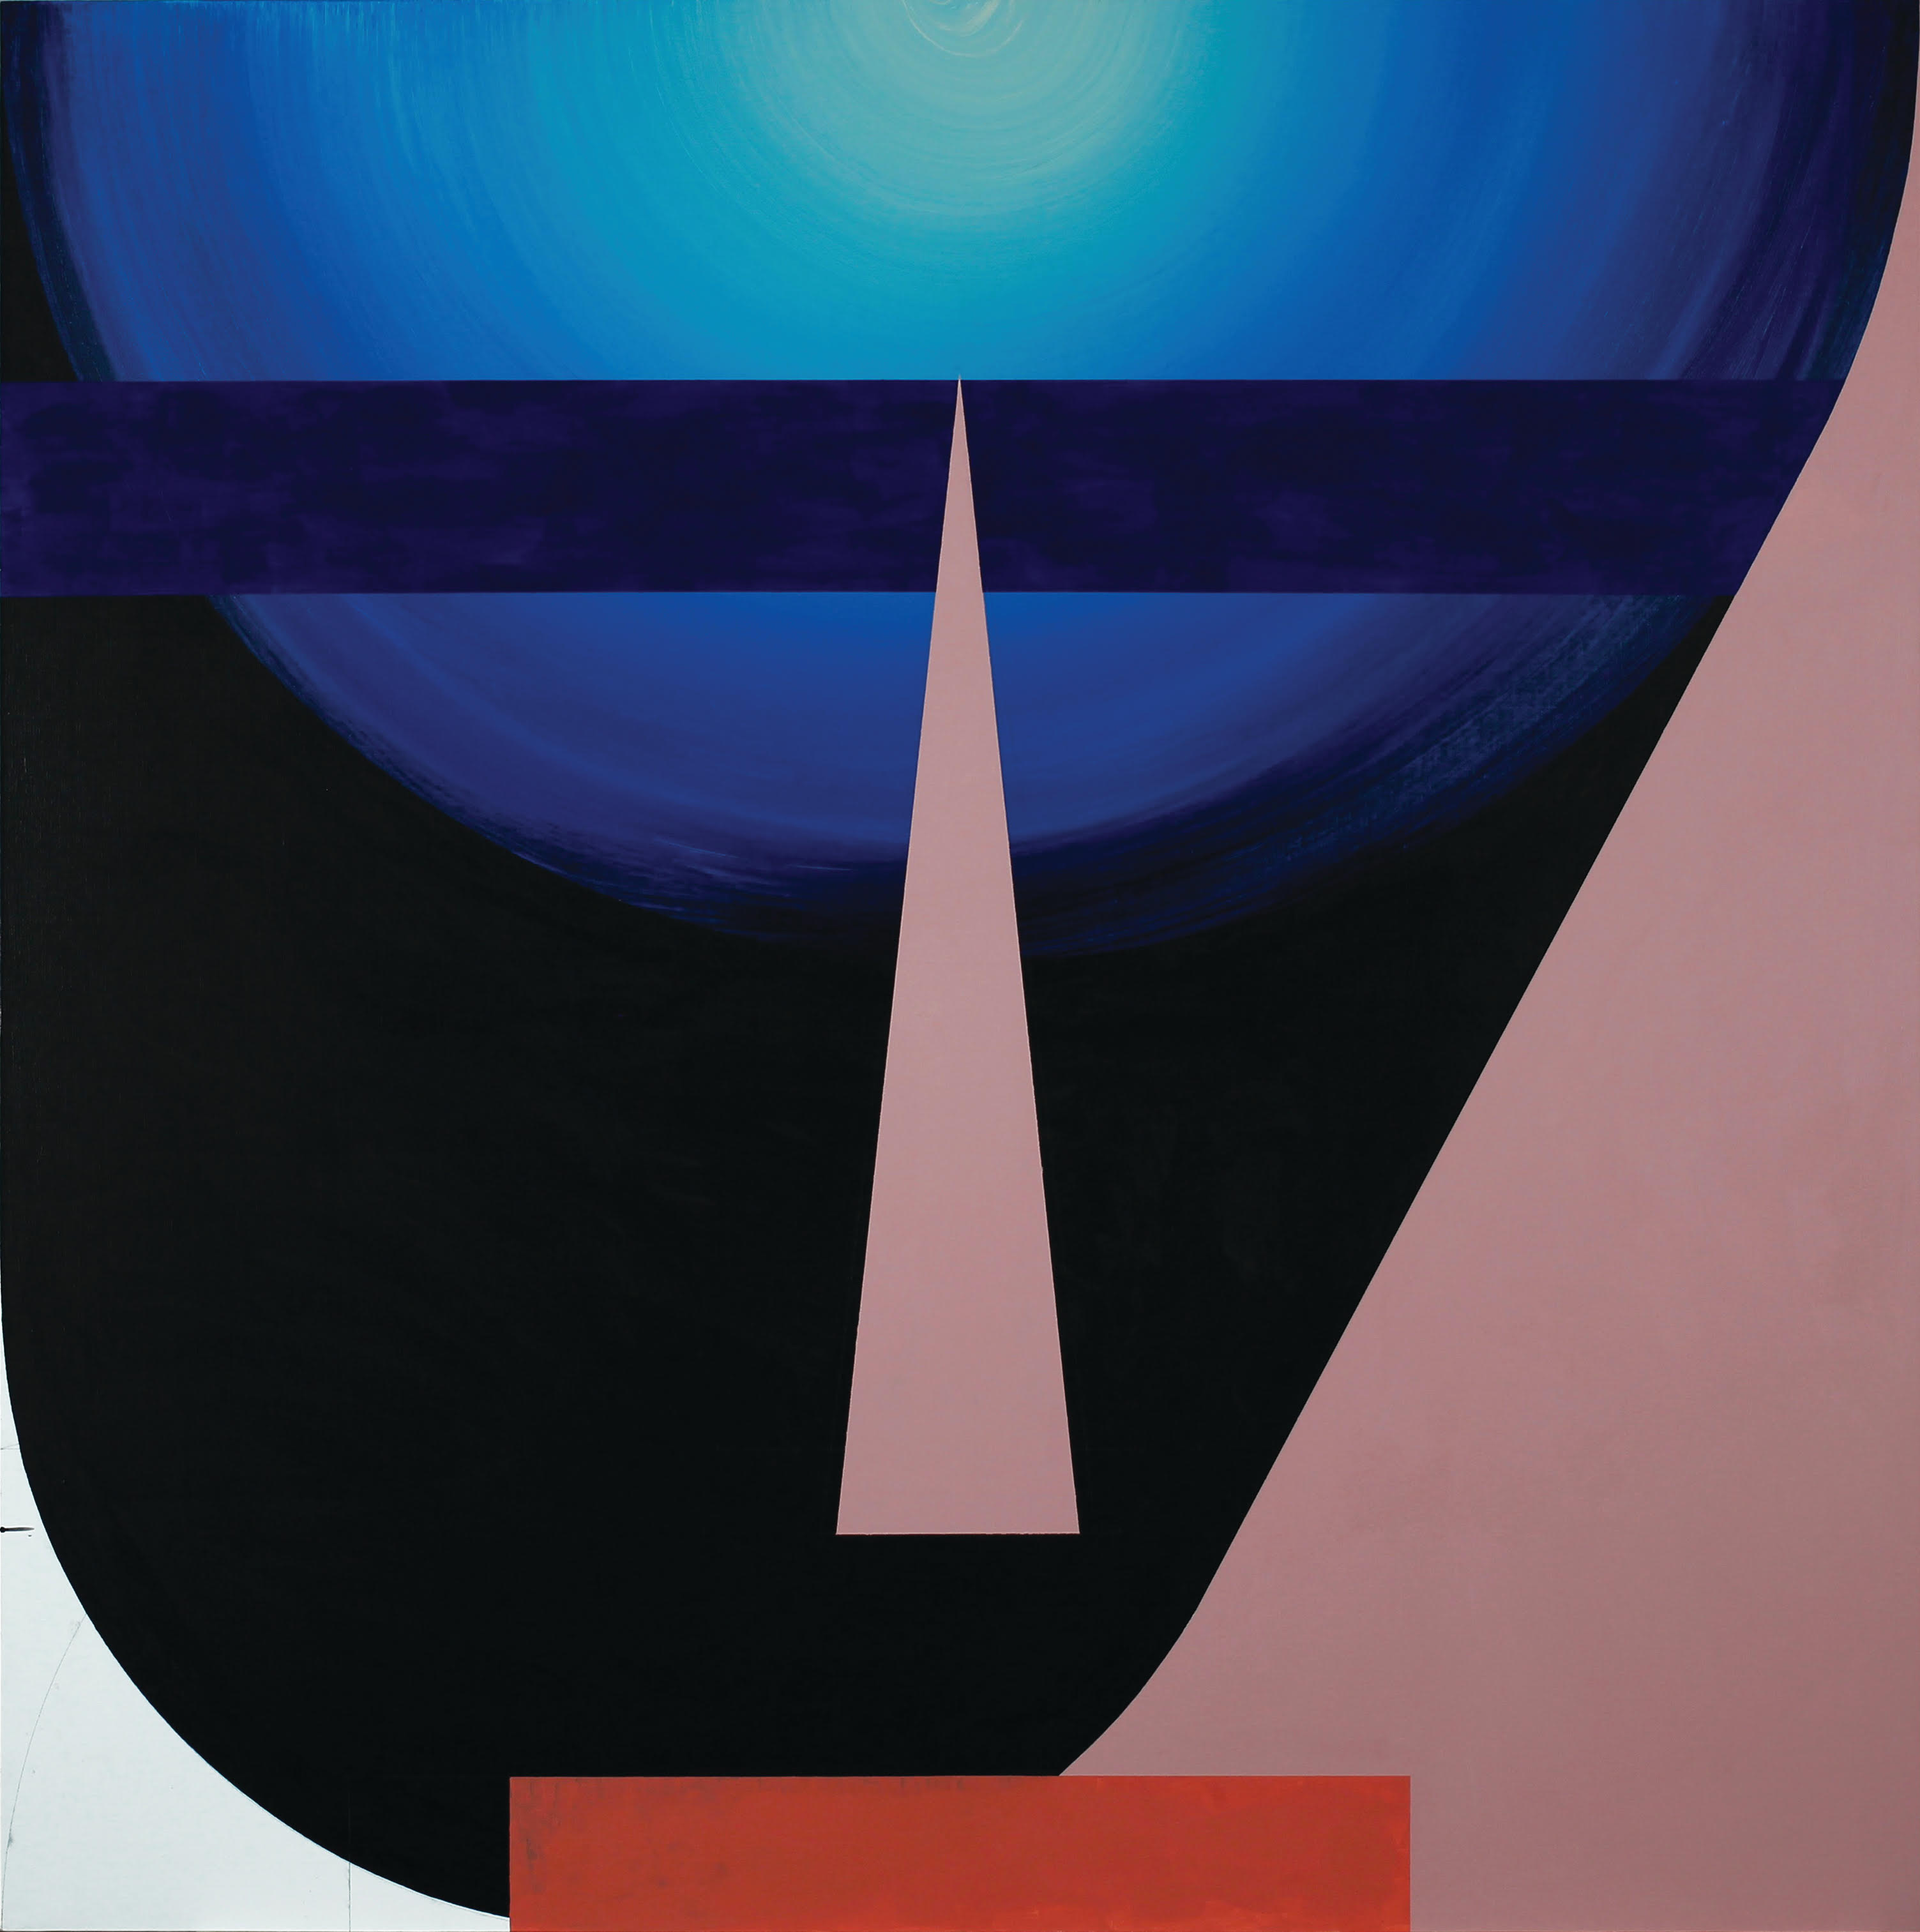 Agata Bogacka, Portrait Composition, 2016, akryl napłótnie, 120 x 120 cm